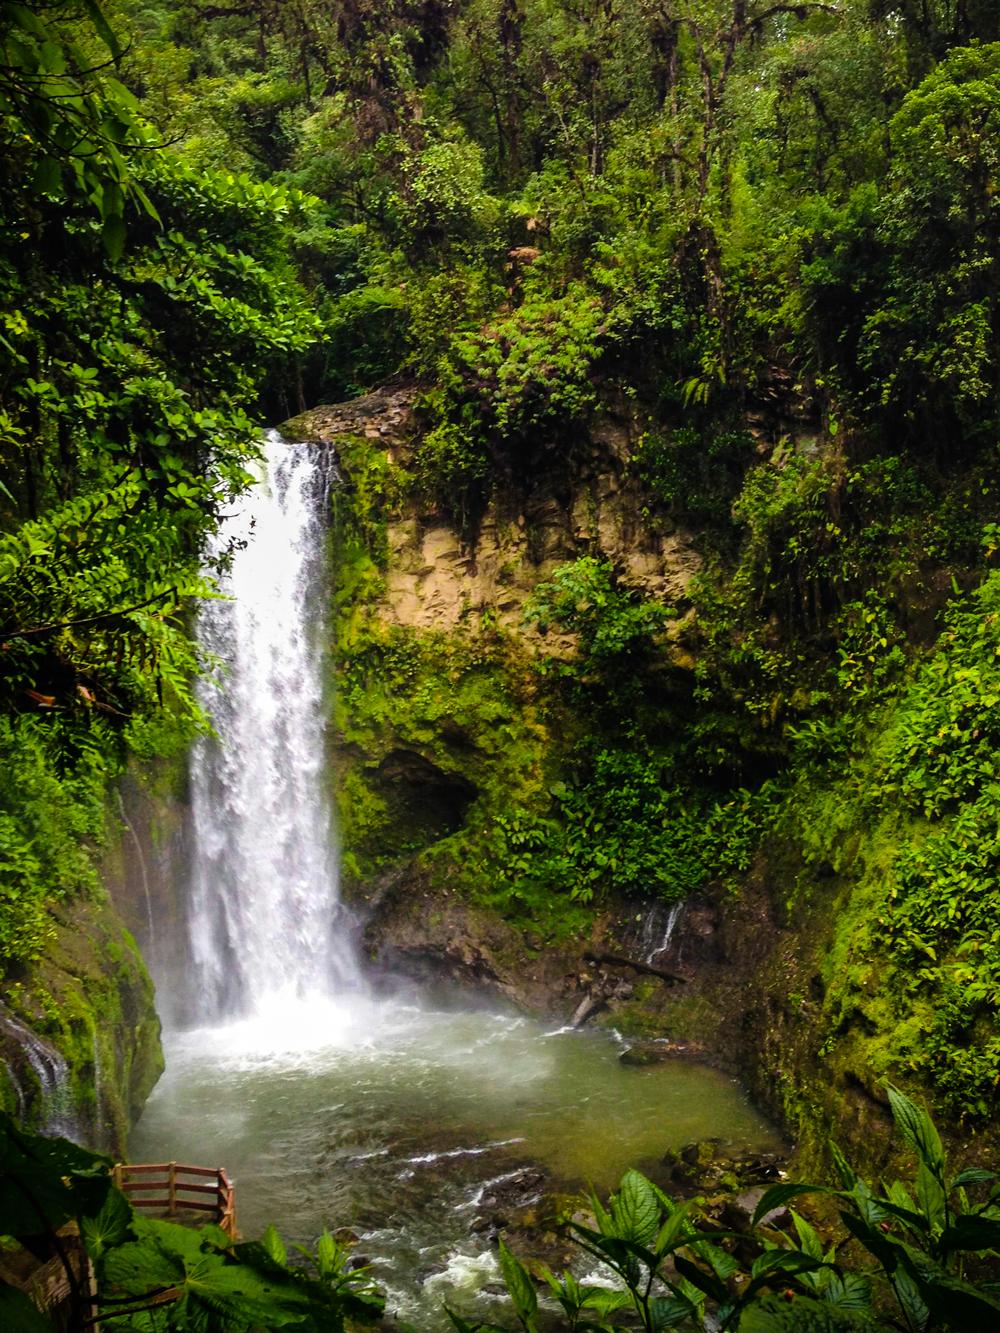 7e594b6c6af31c4e3442bbbc6c4d9a3f - Pura Vida Gardens And Waterfalls Jaco